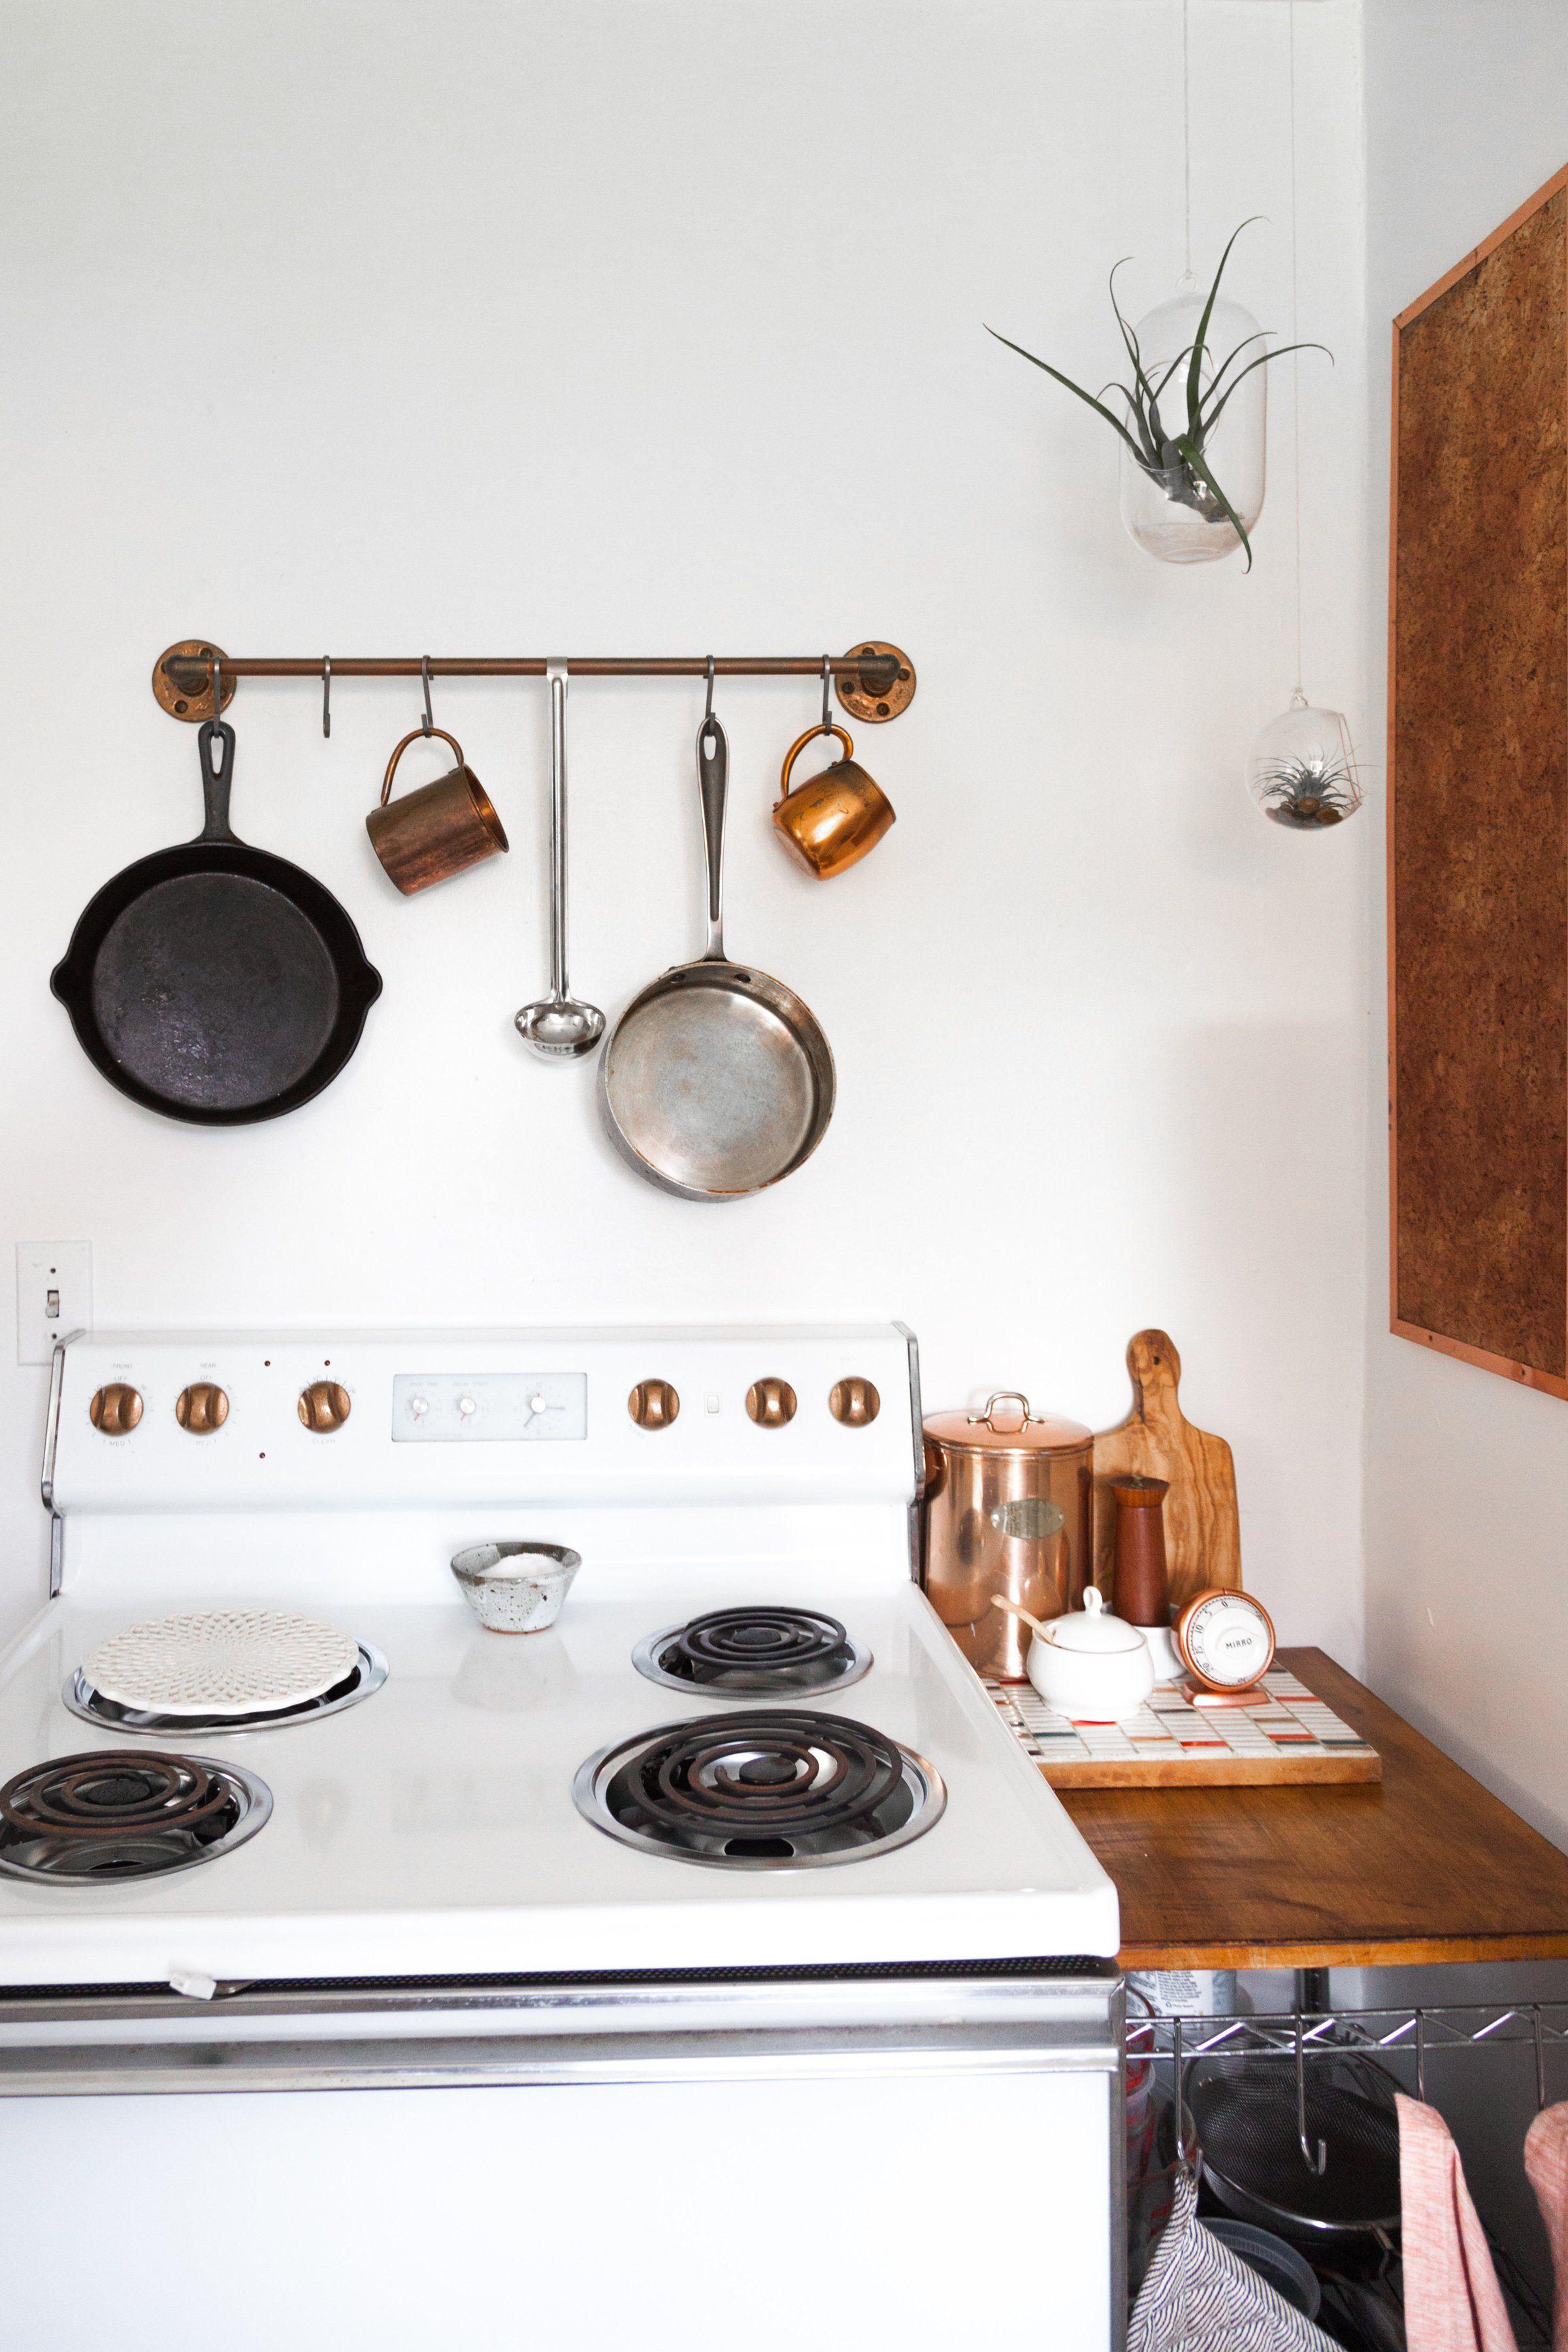 Design Solutions A Lookbook of Good Looking Hanging Pots & Pans